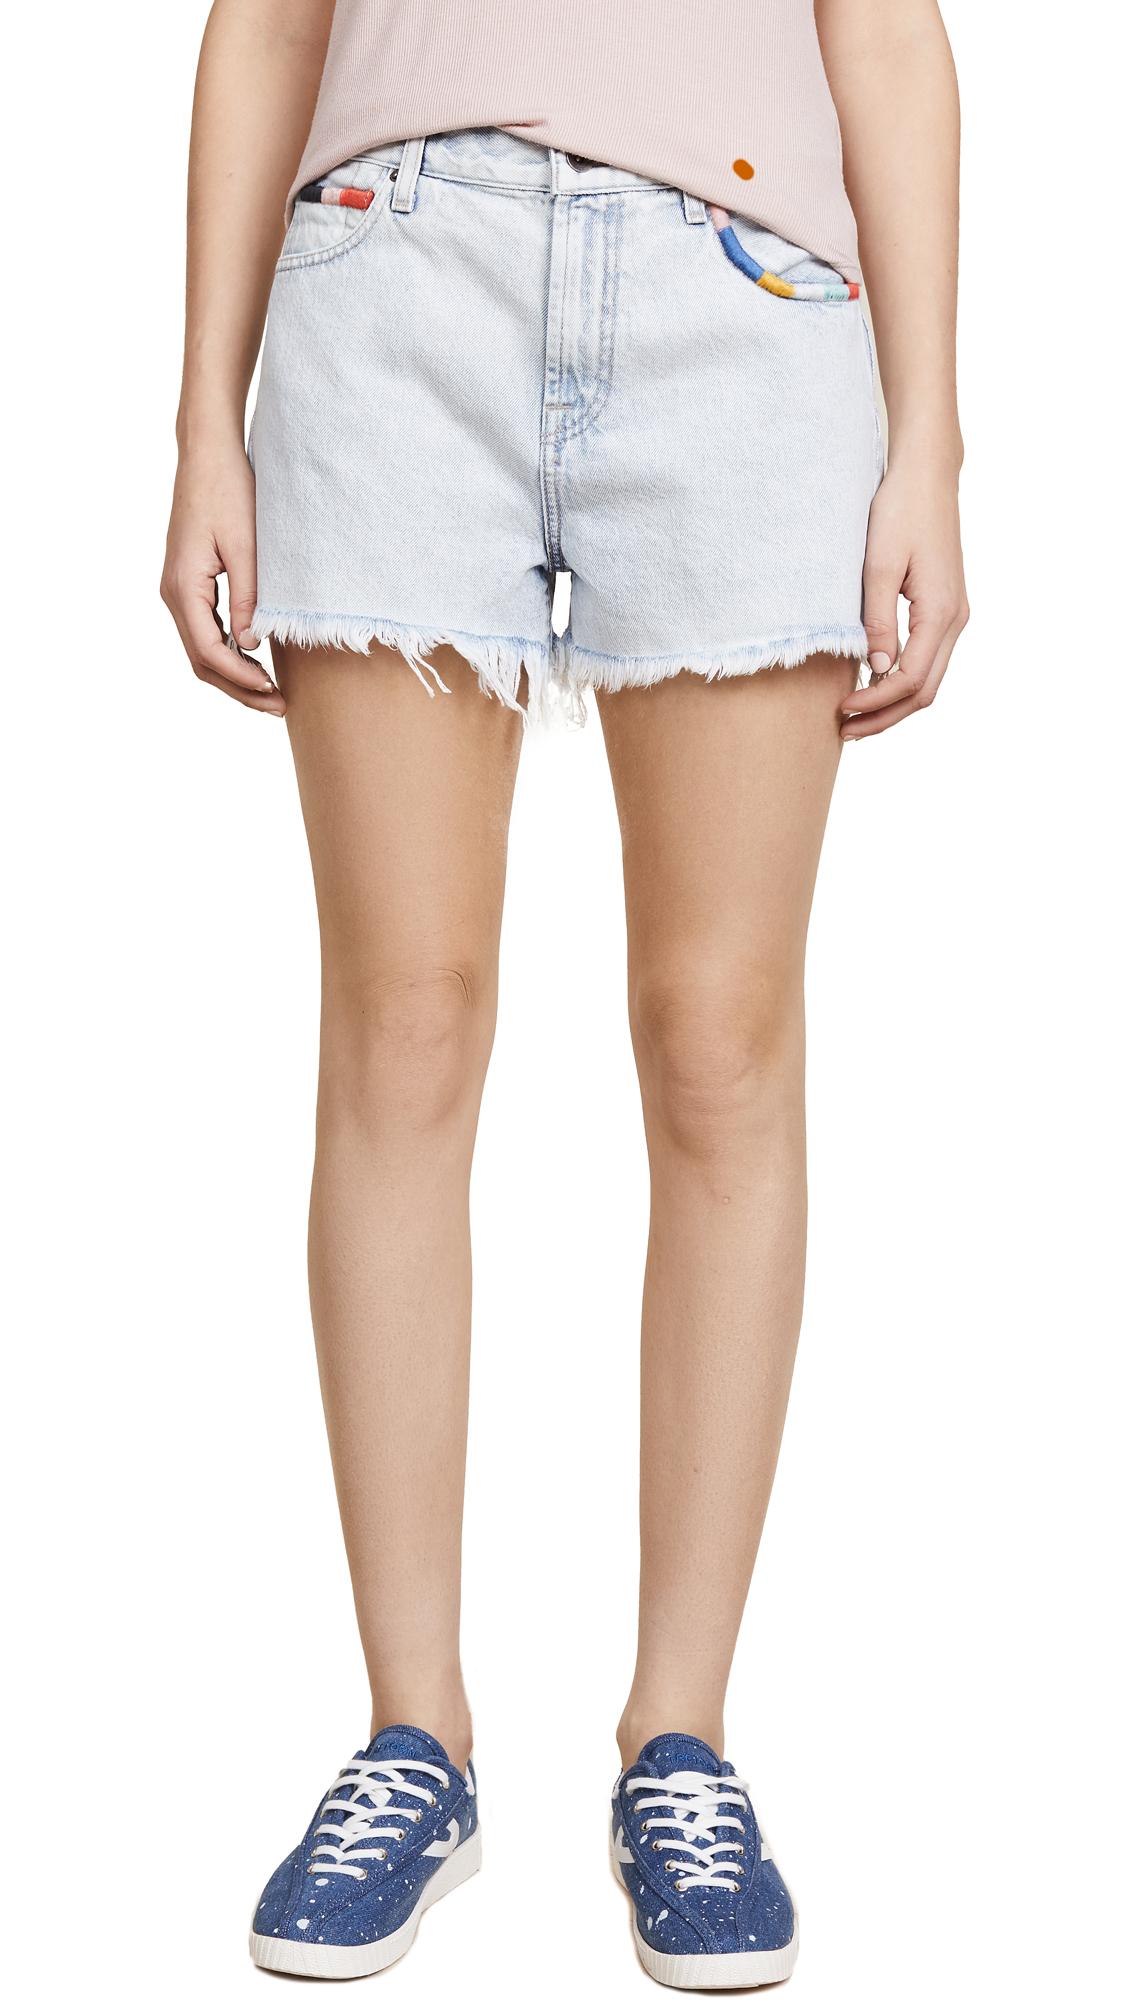 Splendid x Margherita Amore Jean Shorts